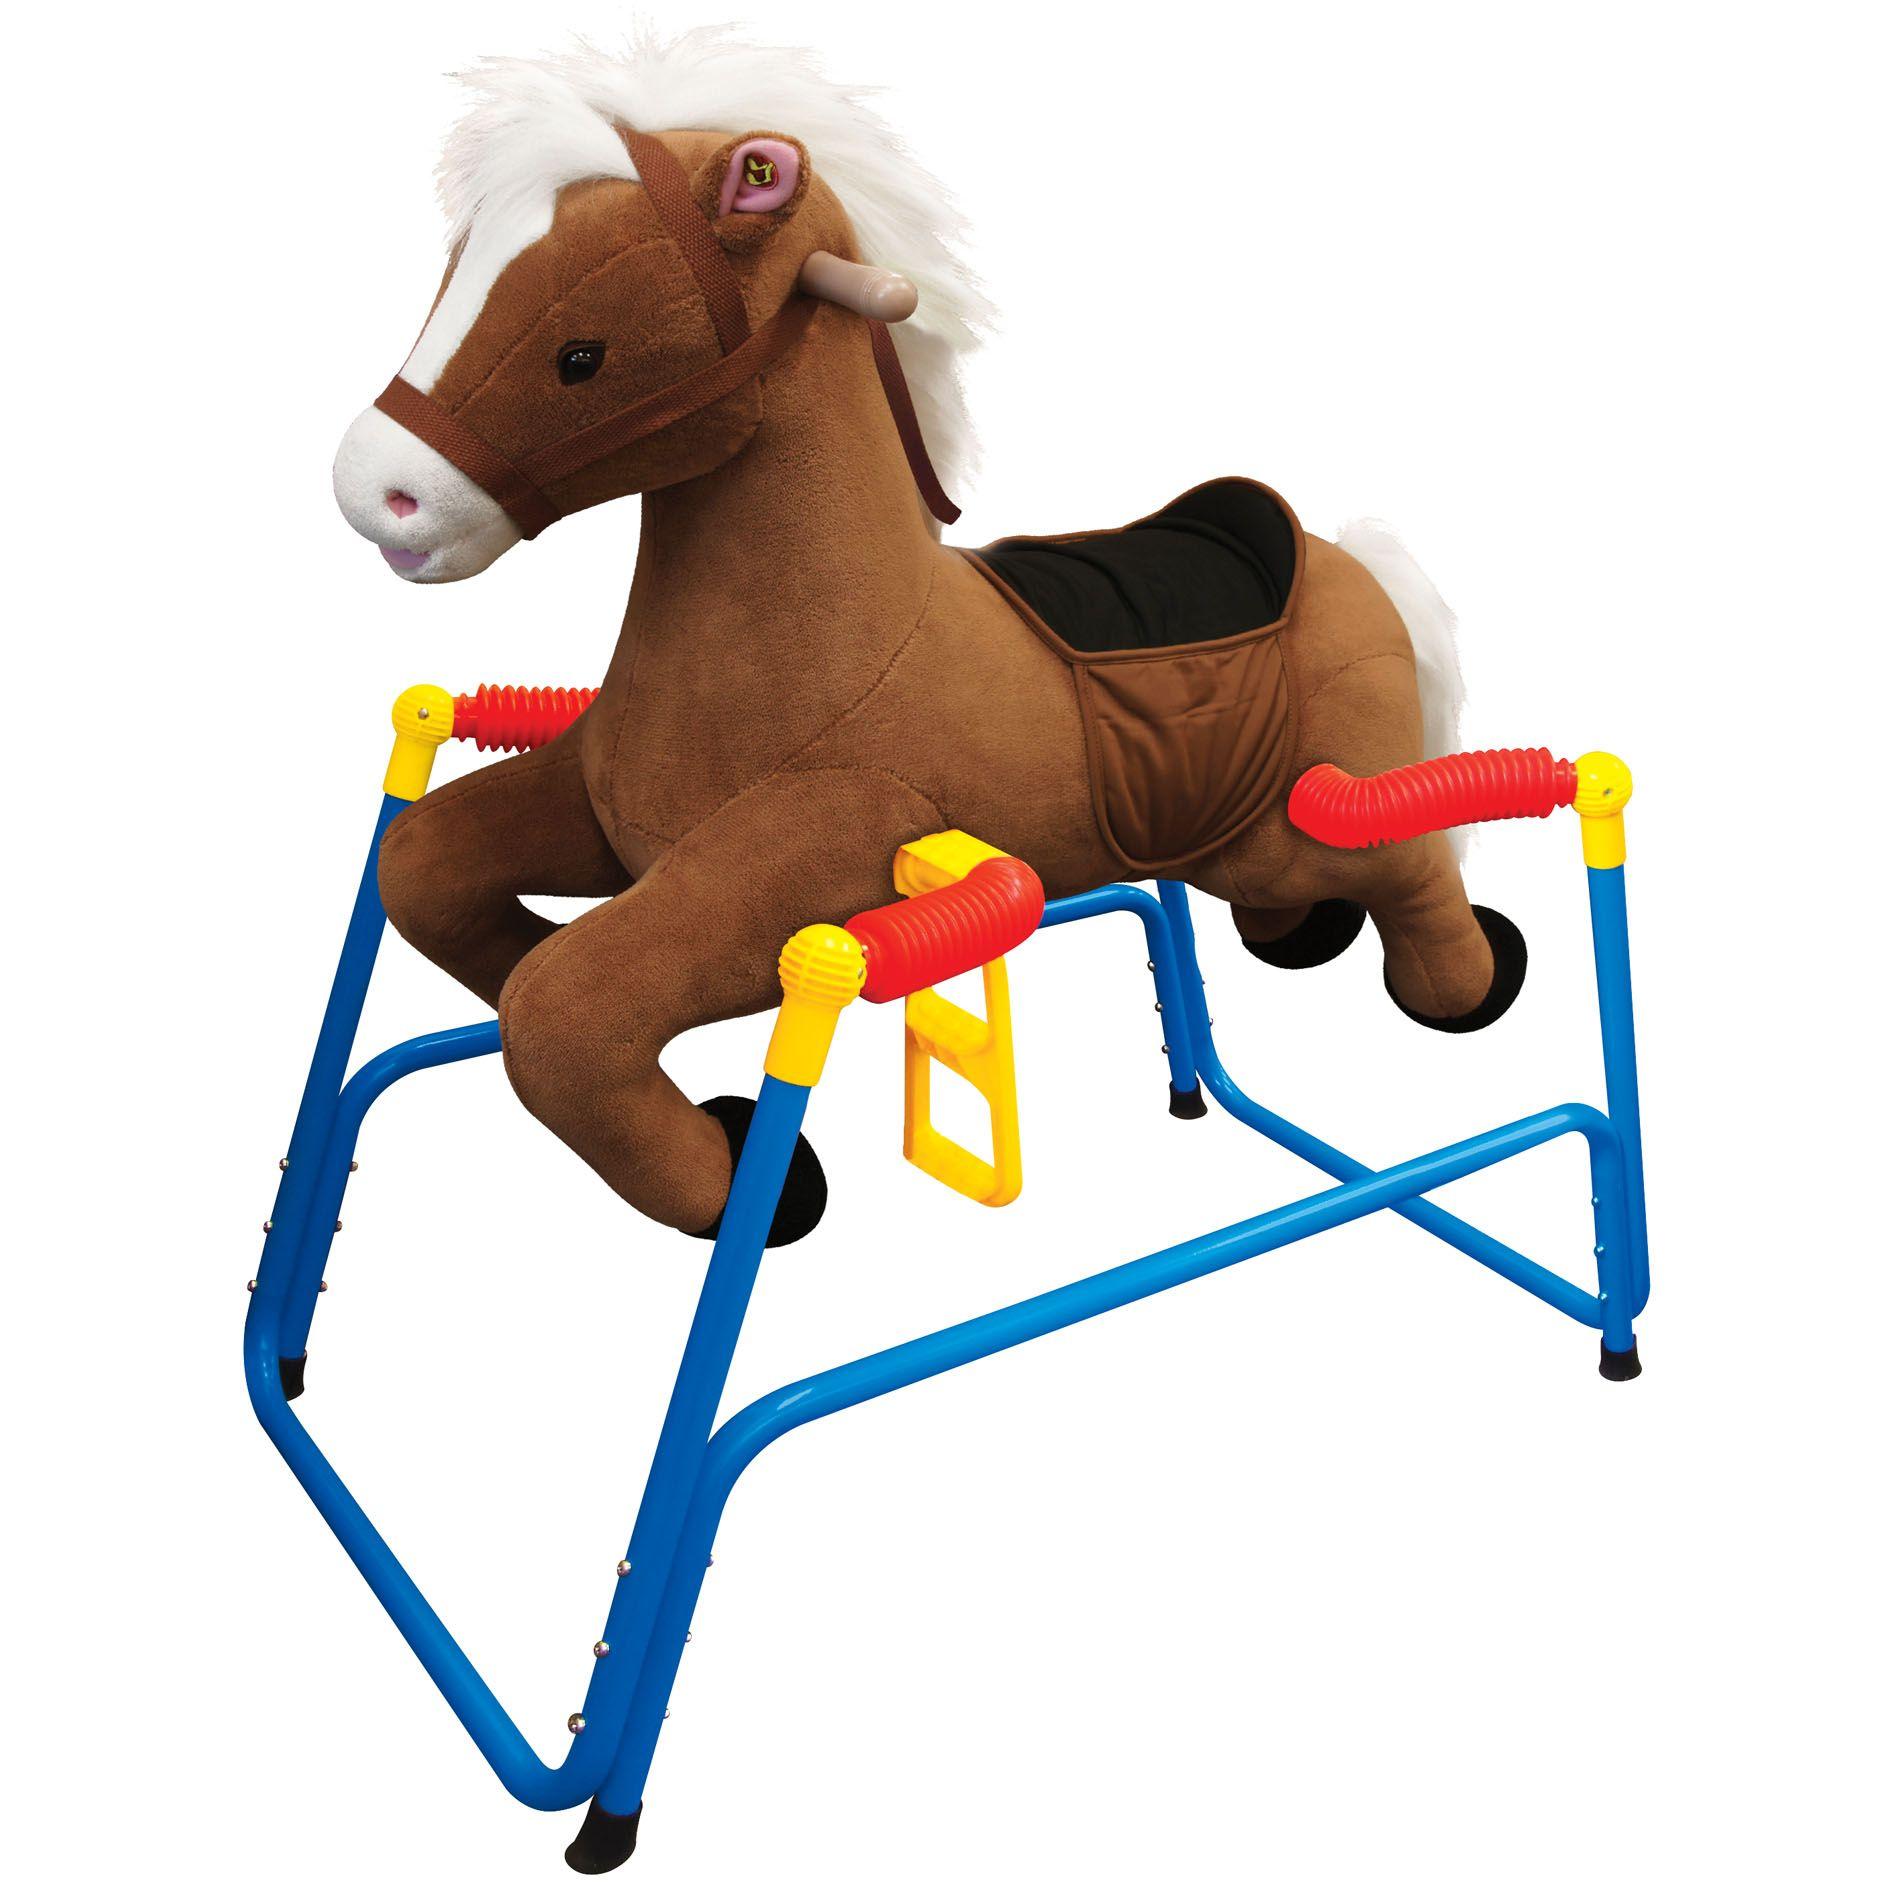 Kiddieland Toys Ltd Plush Bounce N Ride Spring Pony